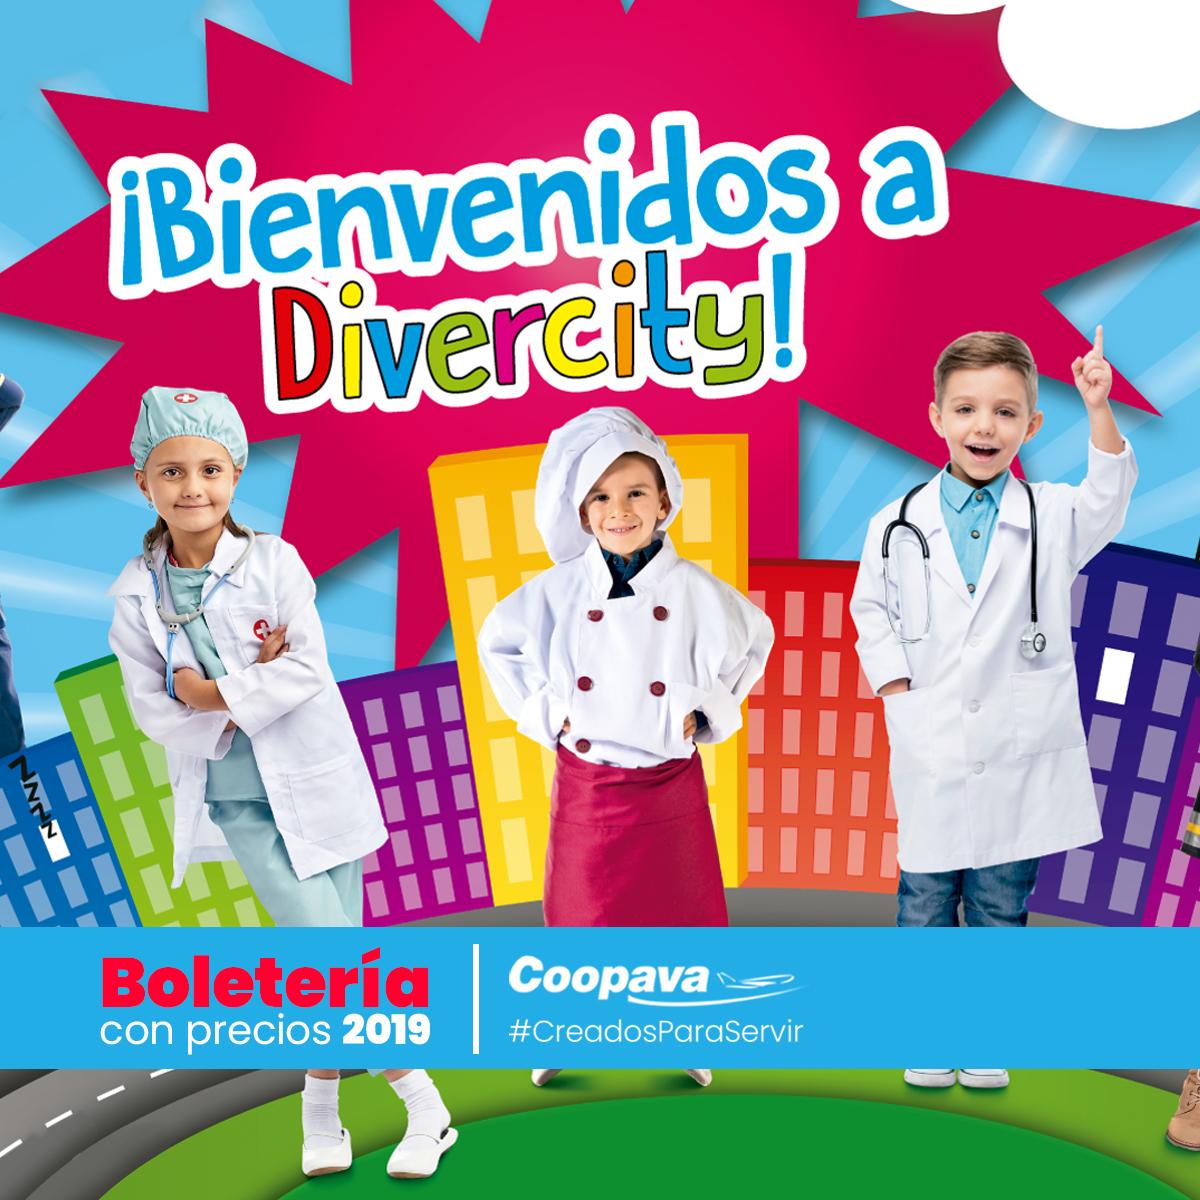 BOLETERIA DIC¿VERCITY+.jpg (772 KB)